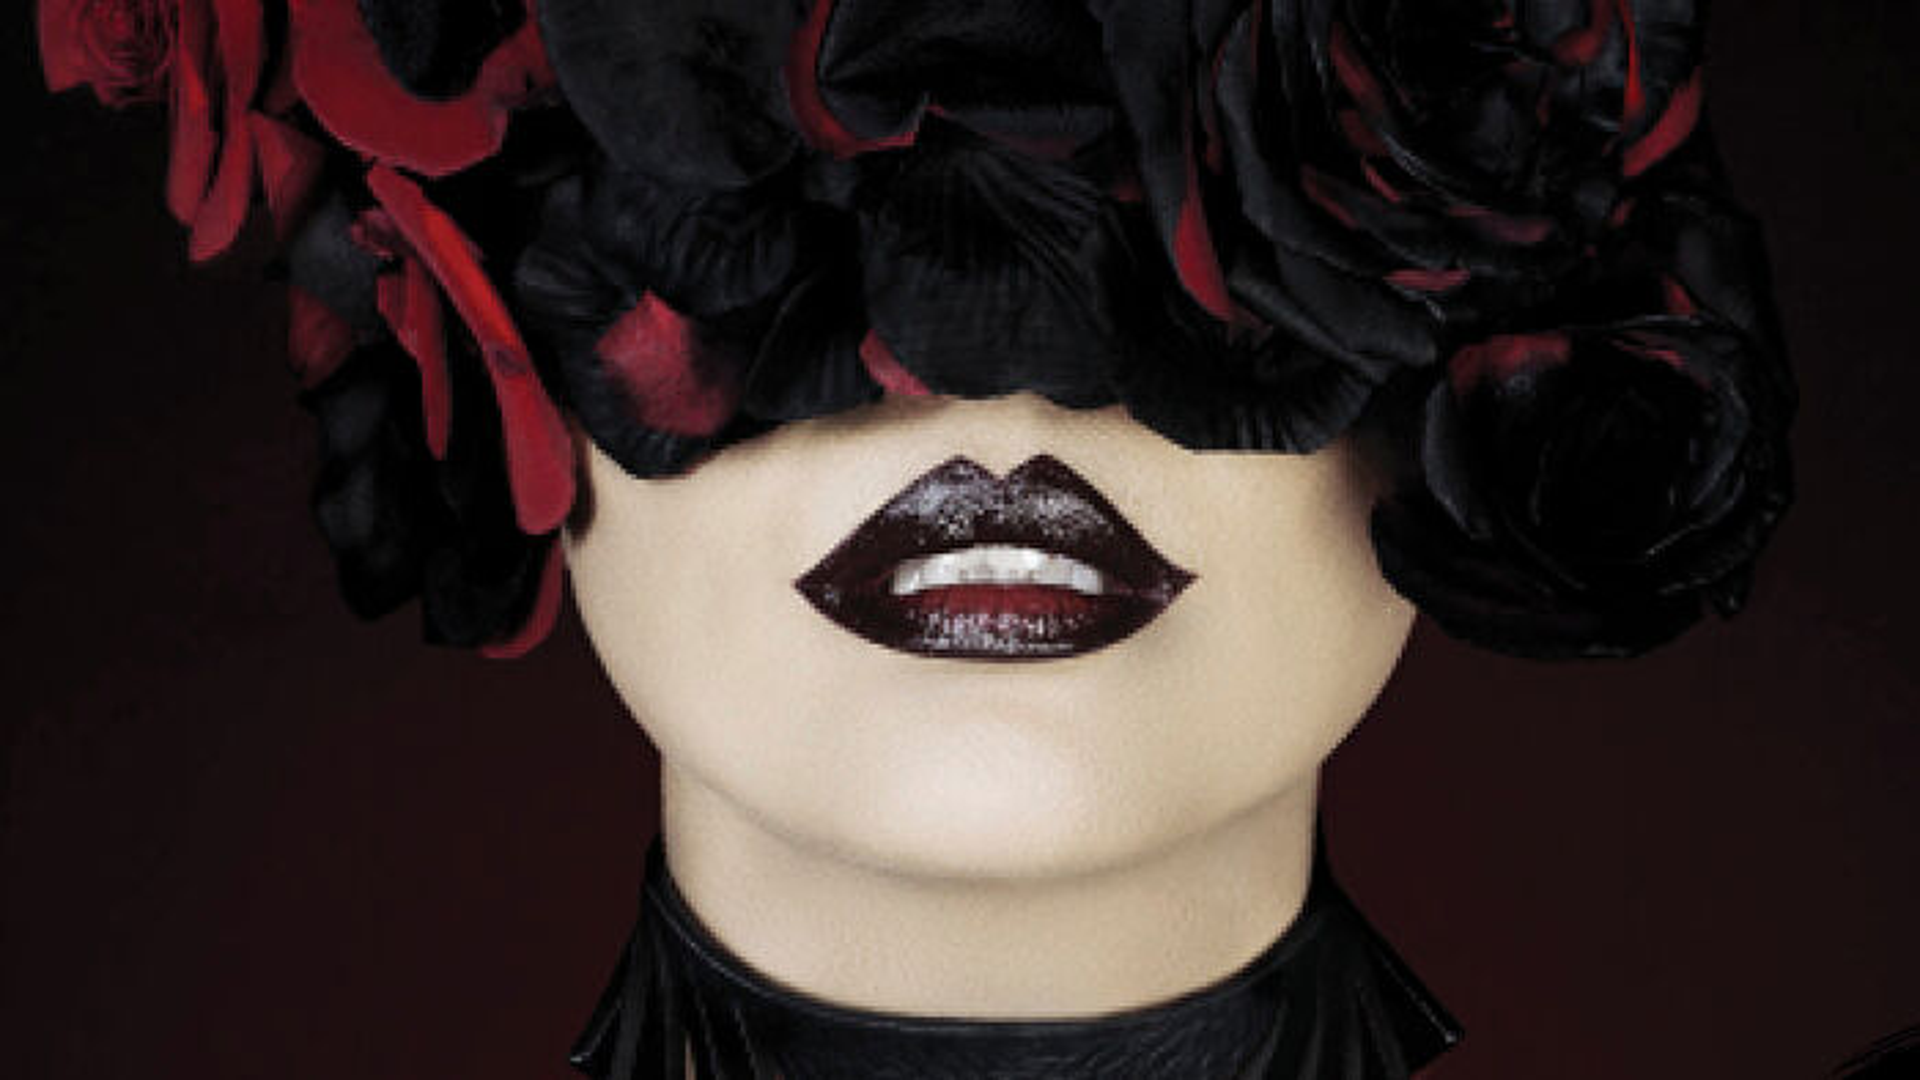 vampire-the-masquerade-5e-rpg-camarilla-cover-art.jpg